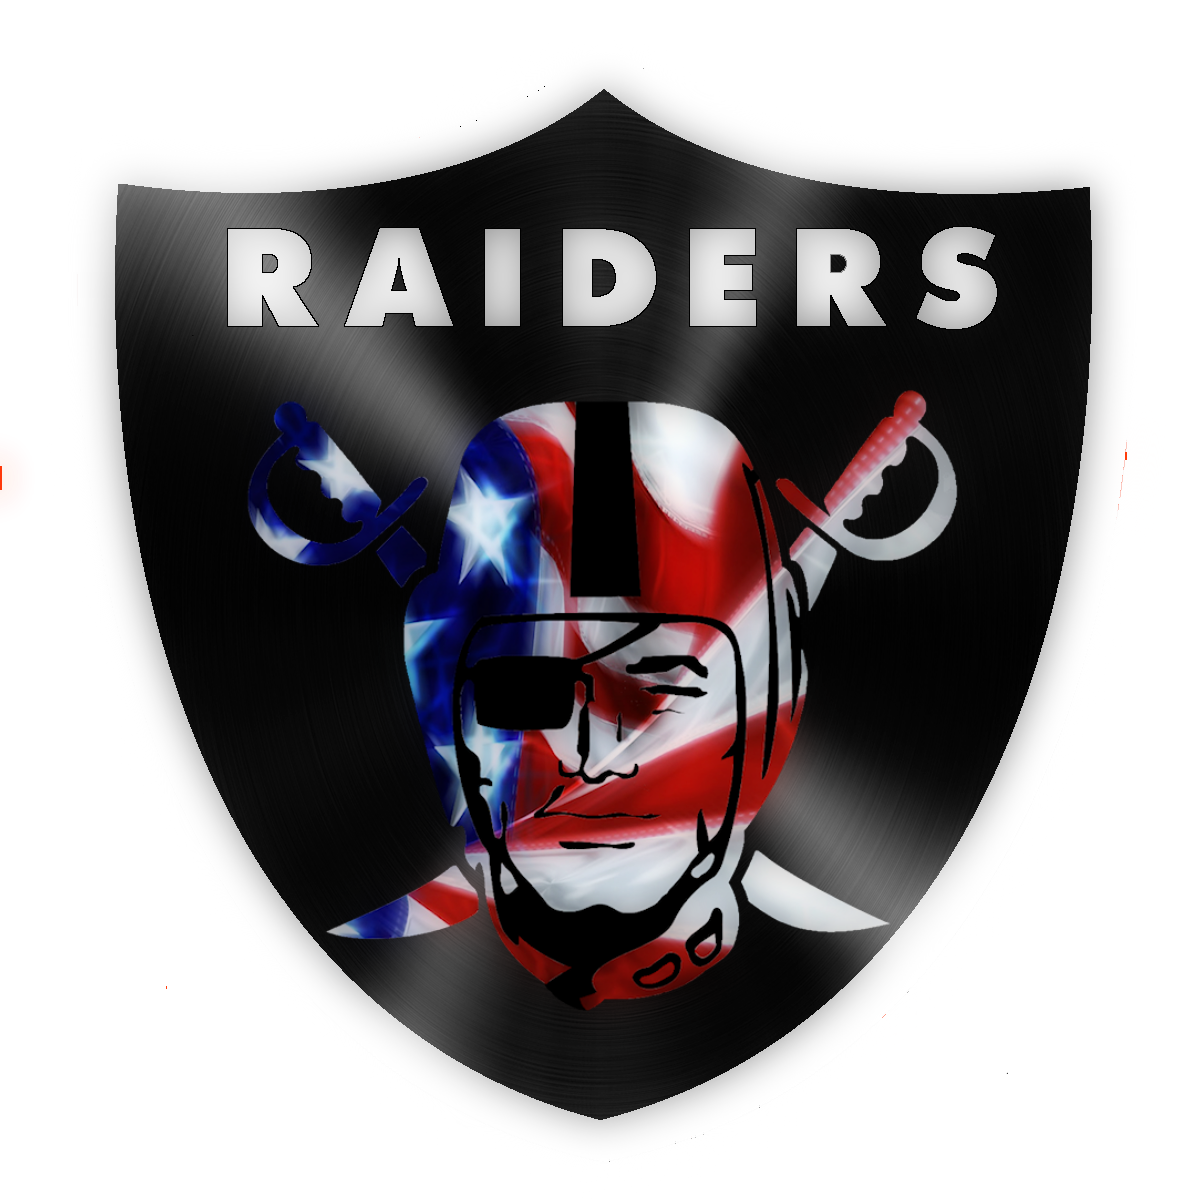 Oakland Raiders Logo | Oakland raiders logo, Nfl oakland ...